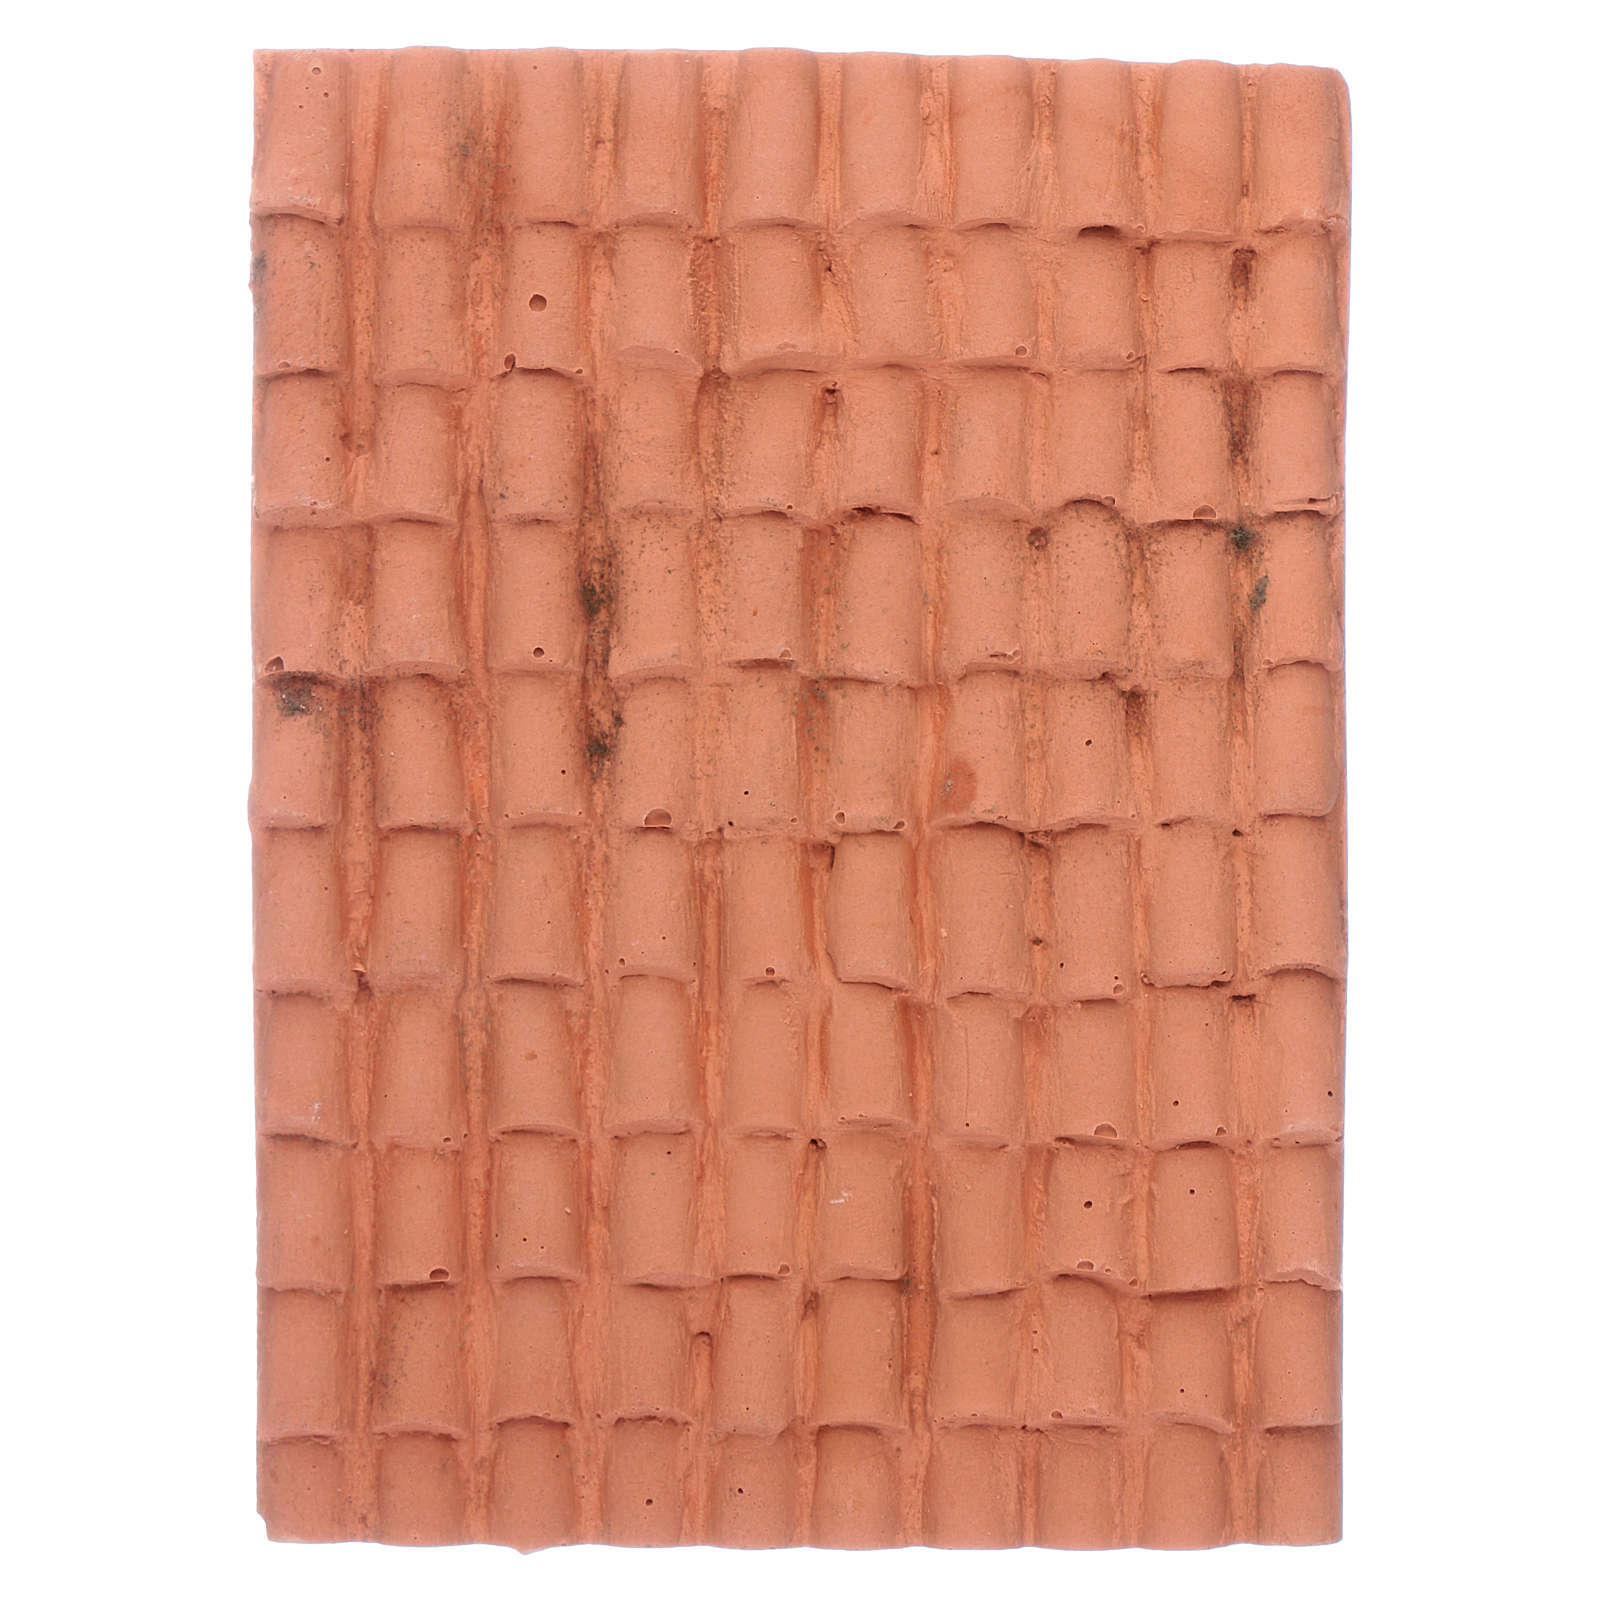 Nativity scene accessory roof with terracotta shingles 10x5 cm 4